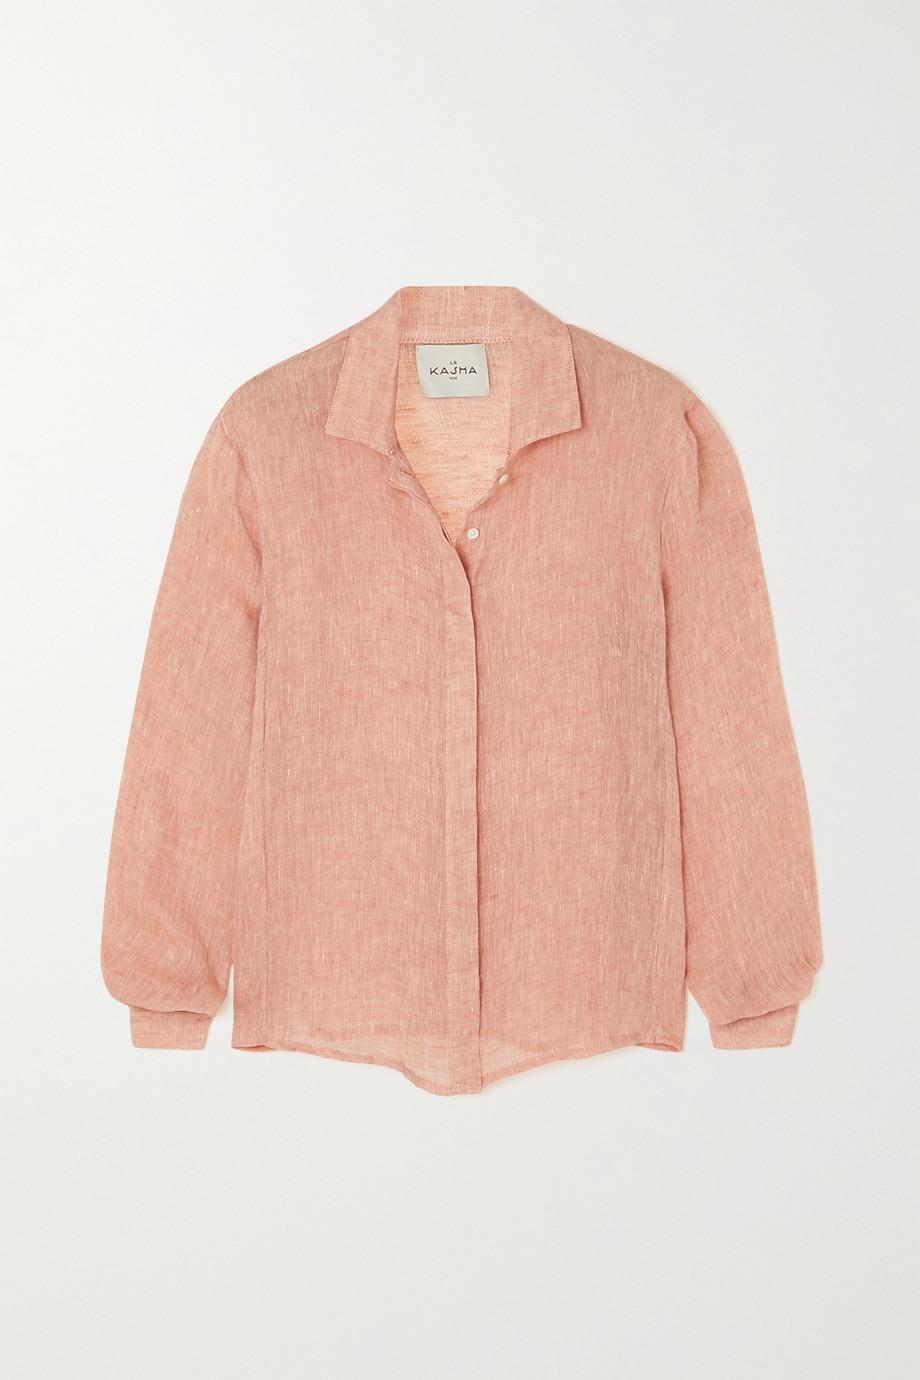 Le Kasha + NET SUSTAIN Sanbu organic linen shirt